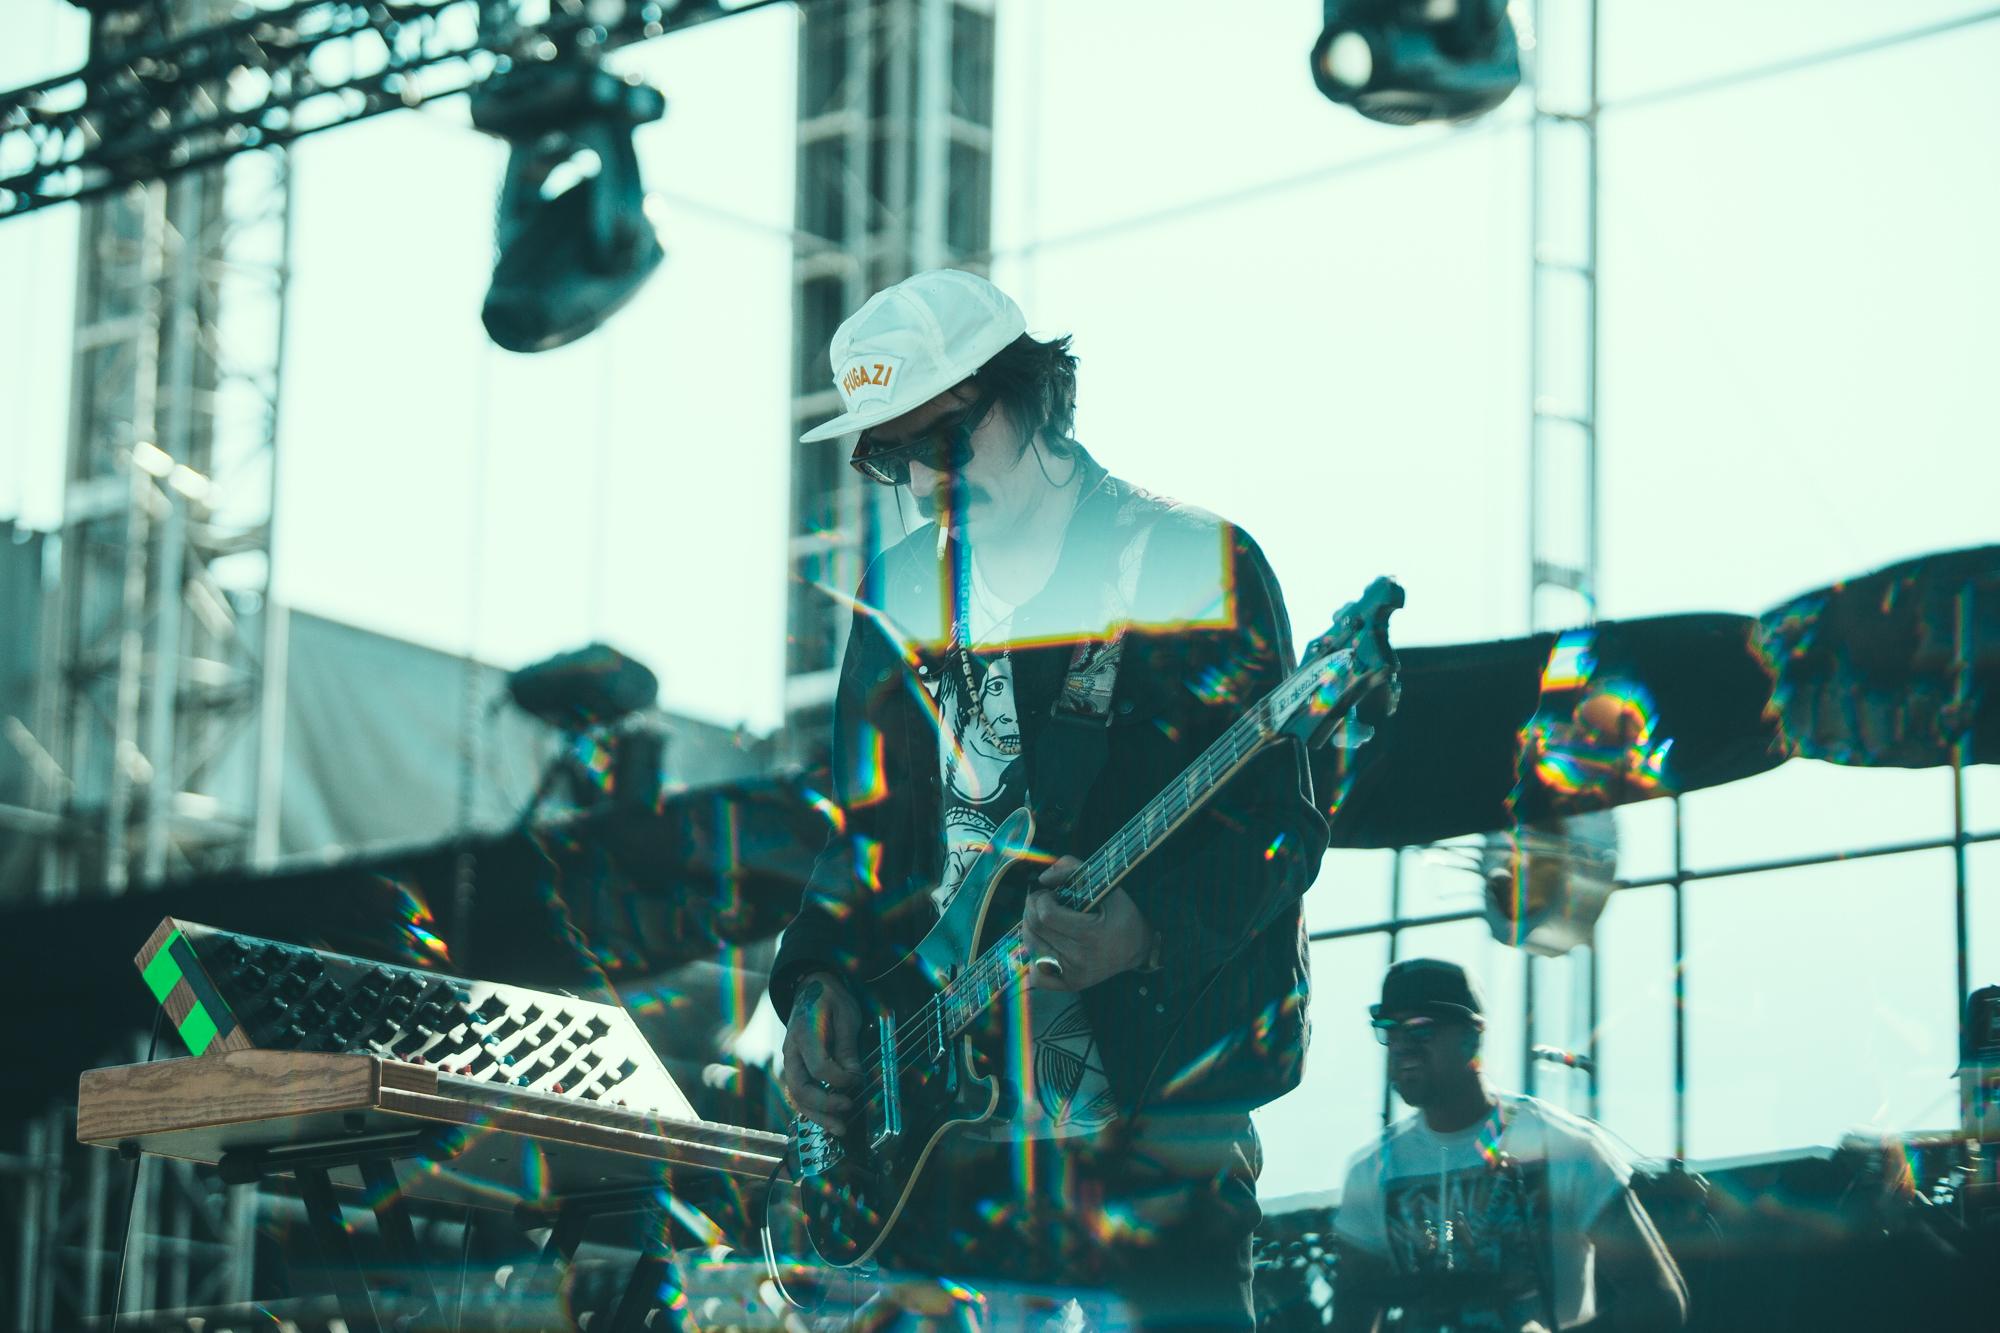 Rey Pila-Festival Ceremonia-Mexico-Foro Pegaso-04.02.2017-Daniel Patlan_Desde 1989 (2 of 24).jpg